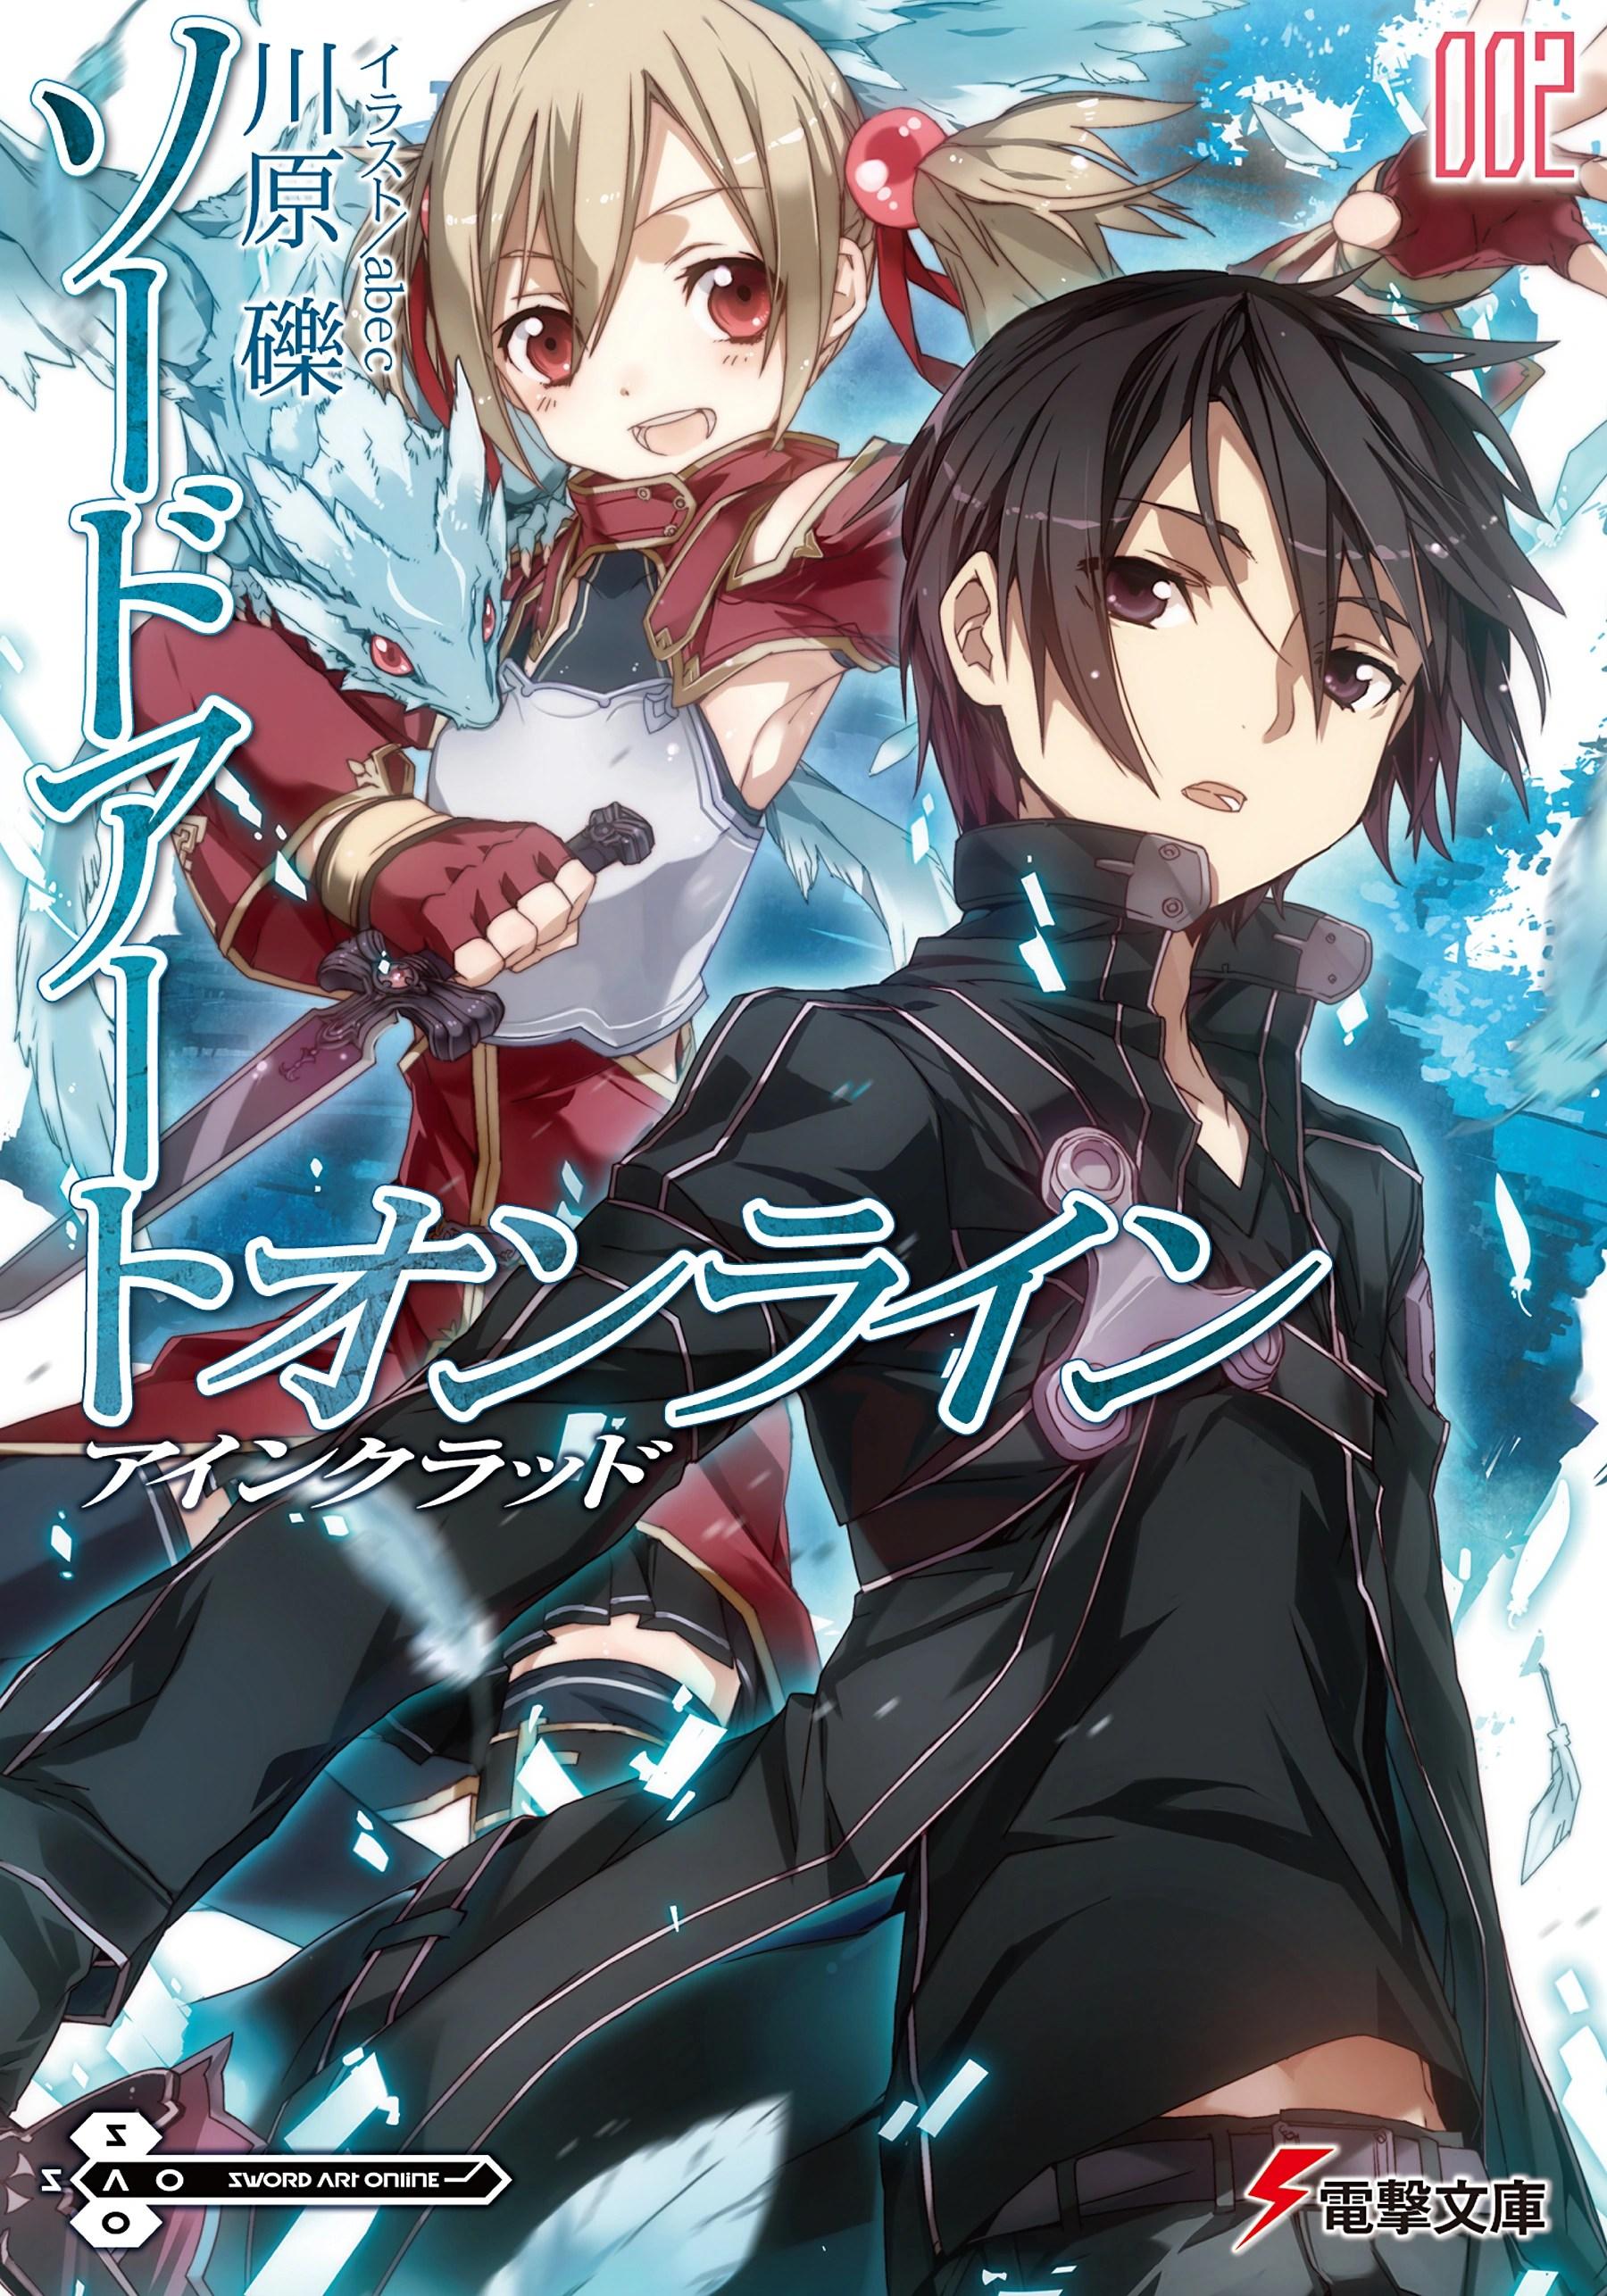 Sword Art Online 2: Aincrad (light novel) by Reki Kawahara